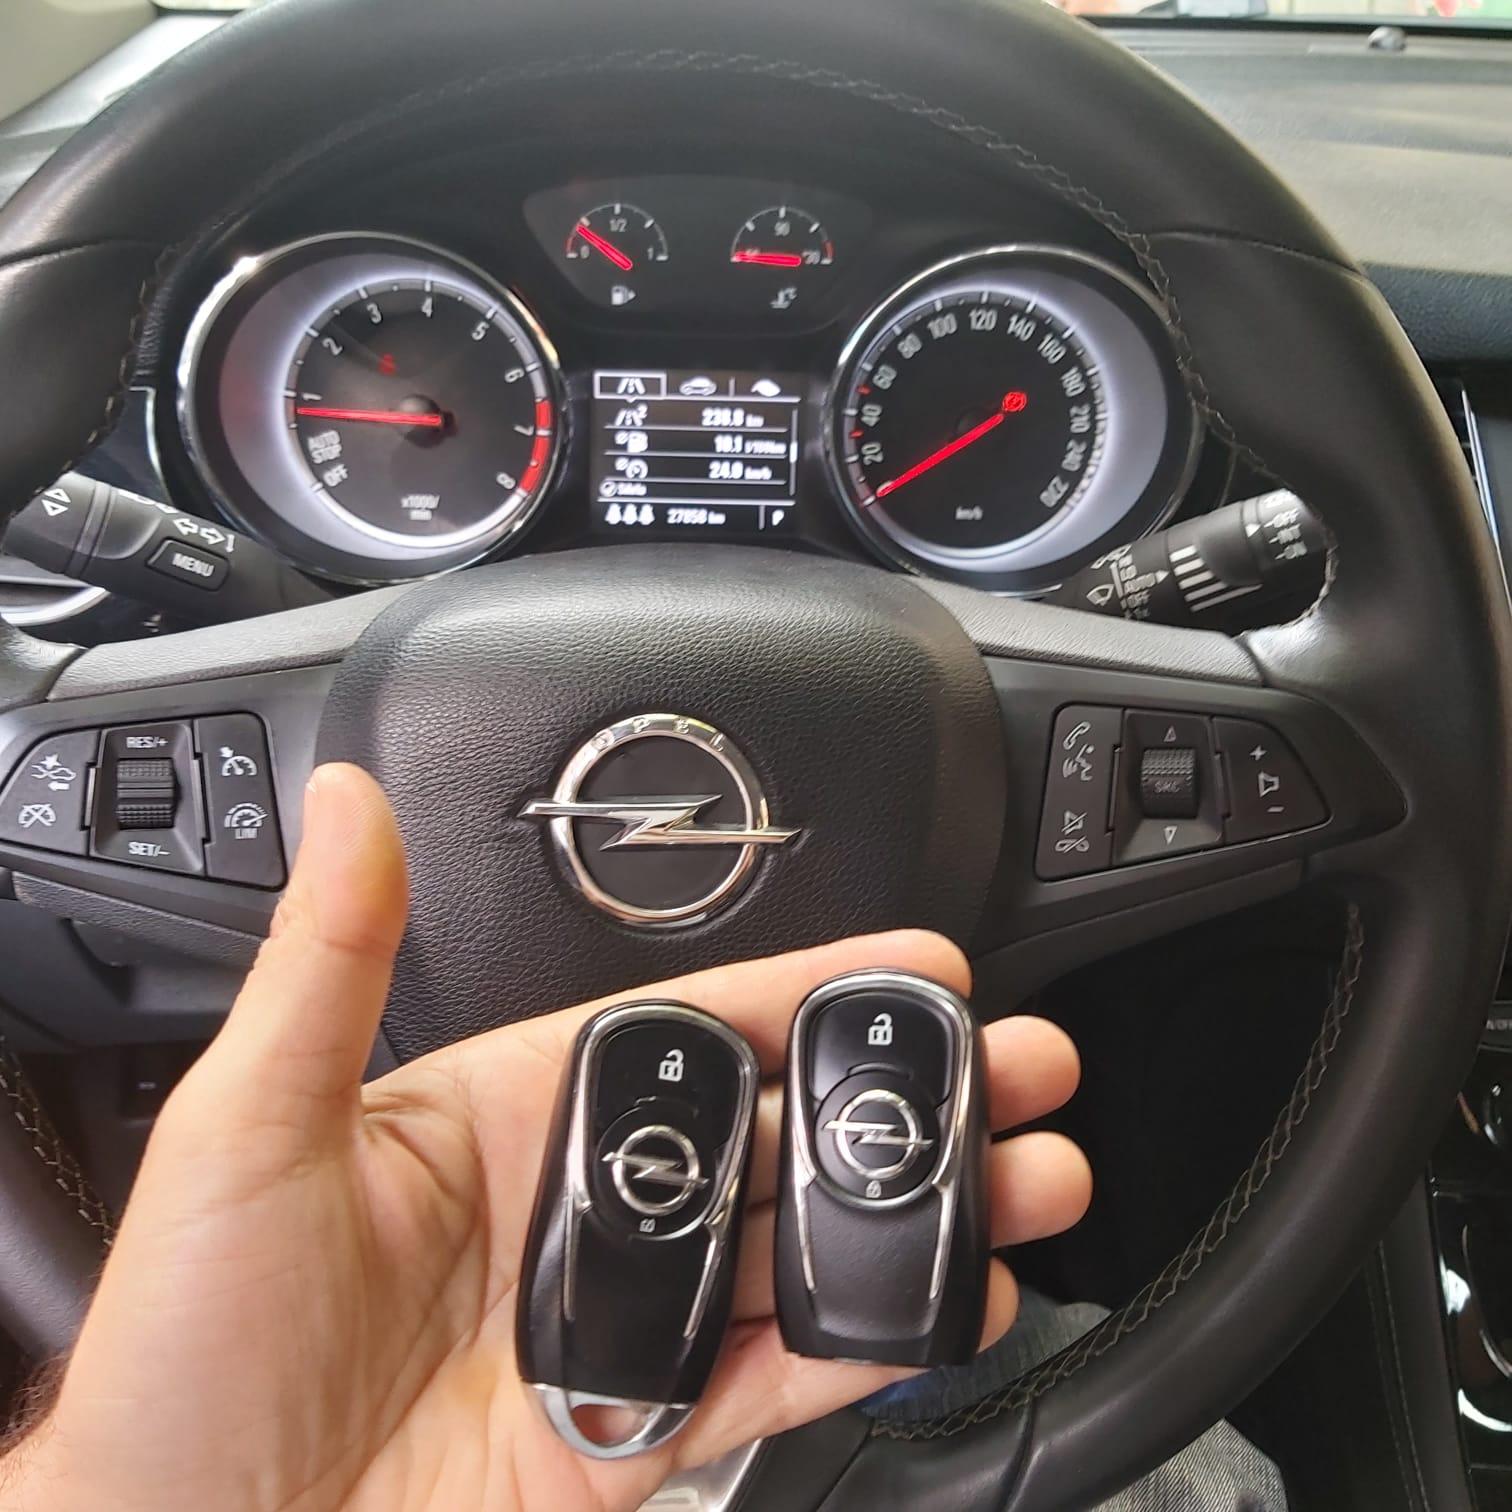 Opel Anahtar oto anahtar kopyalama maltepe Oto Anahtar kopyalama maltepe opel astar k smart anahtar